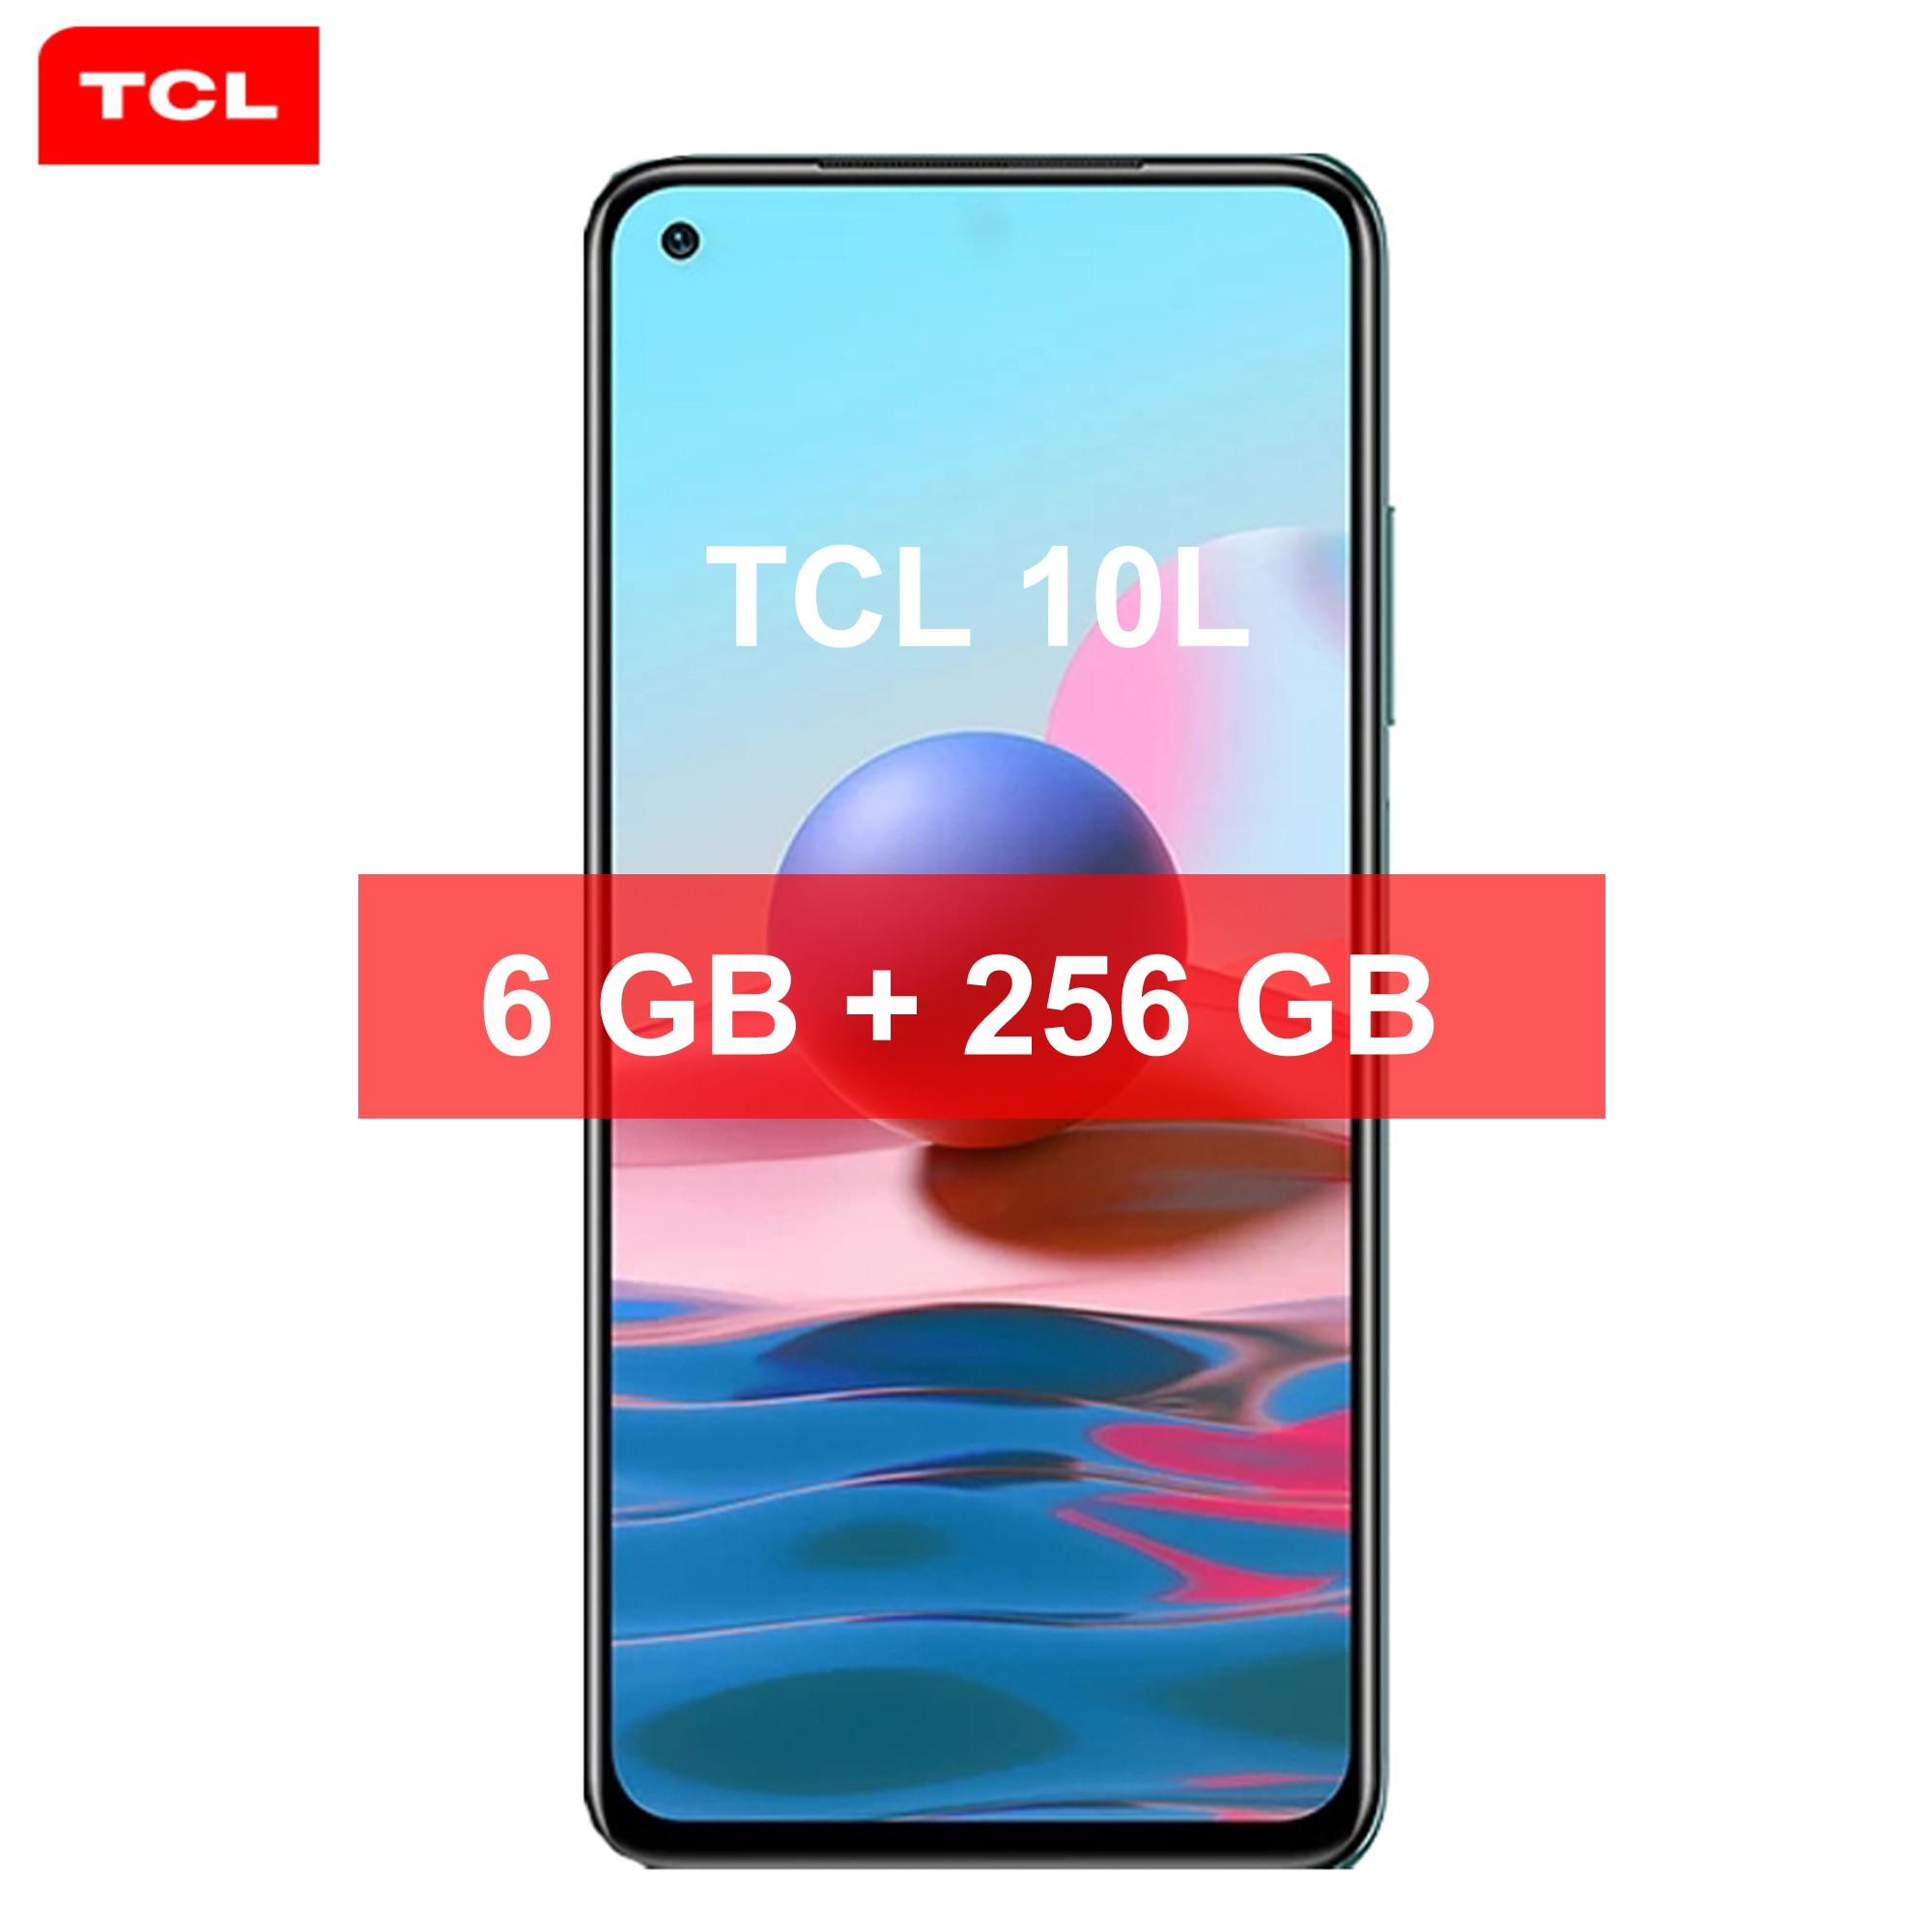 TCL 10L Quad Камера смартфон NFC 6 ГБ + 256 ГБ 6,53» 4000 мА/ч, ОС Android 11,0 Dual SIM телефон 4 аппарат не привязан к оператору сотовой связи для сотового телефона ...